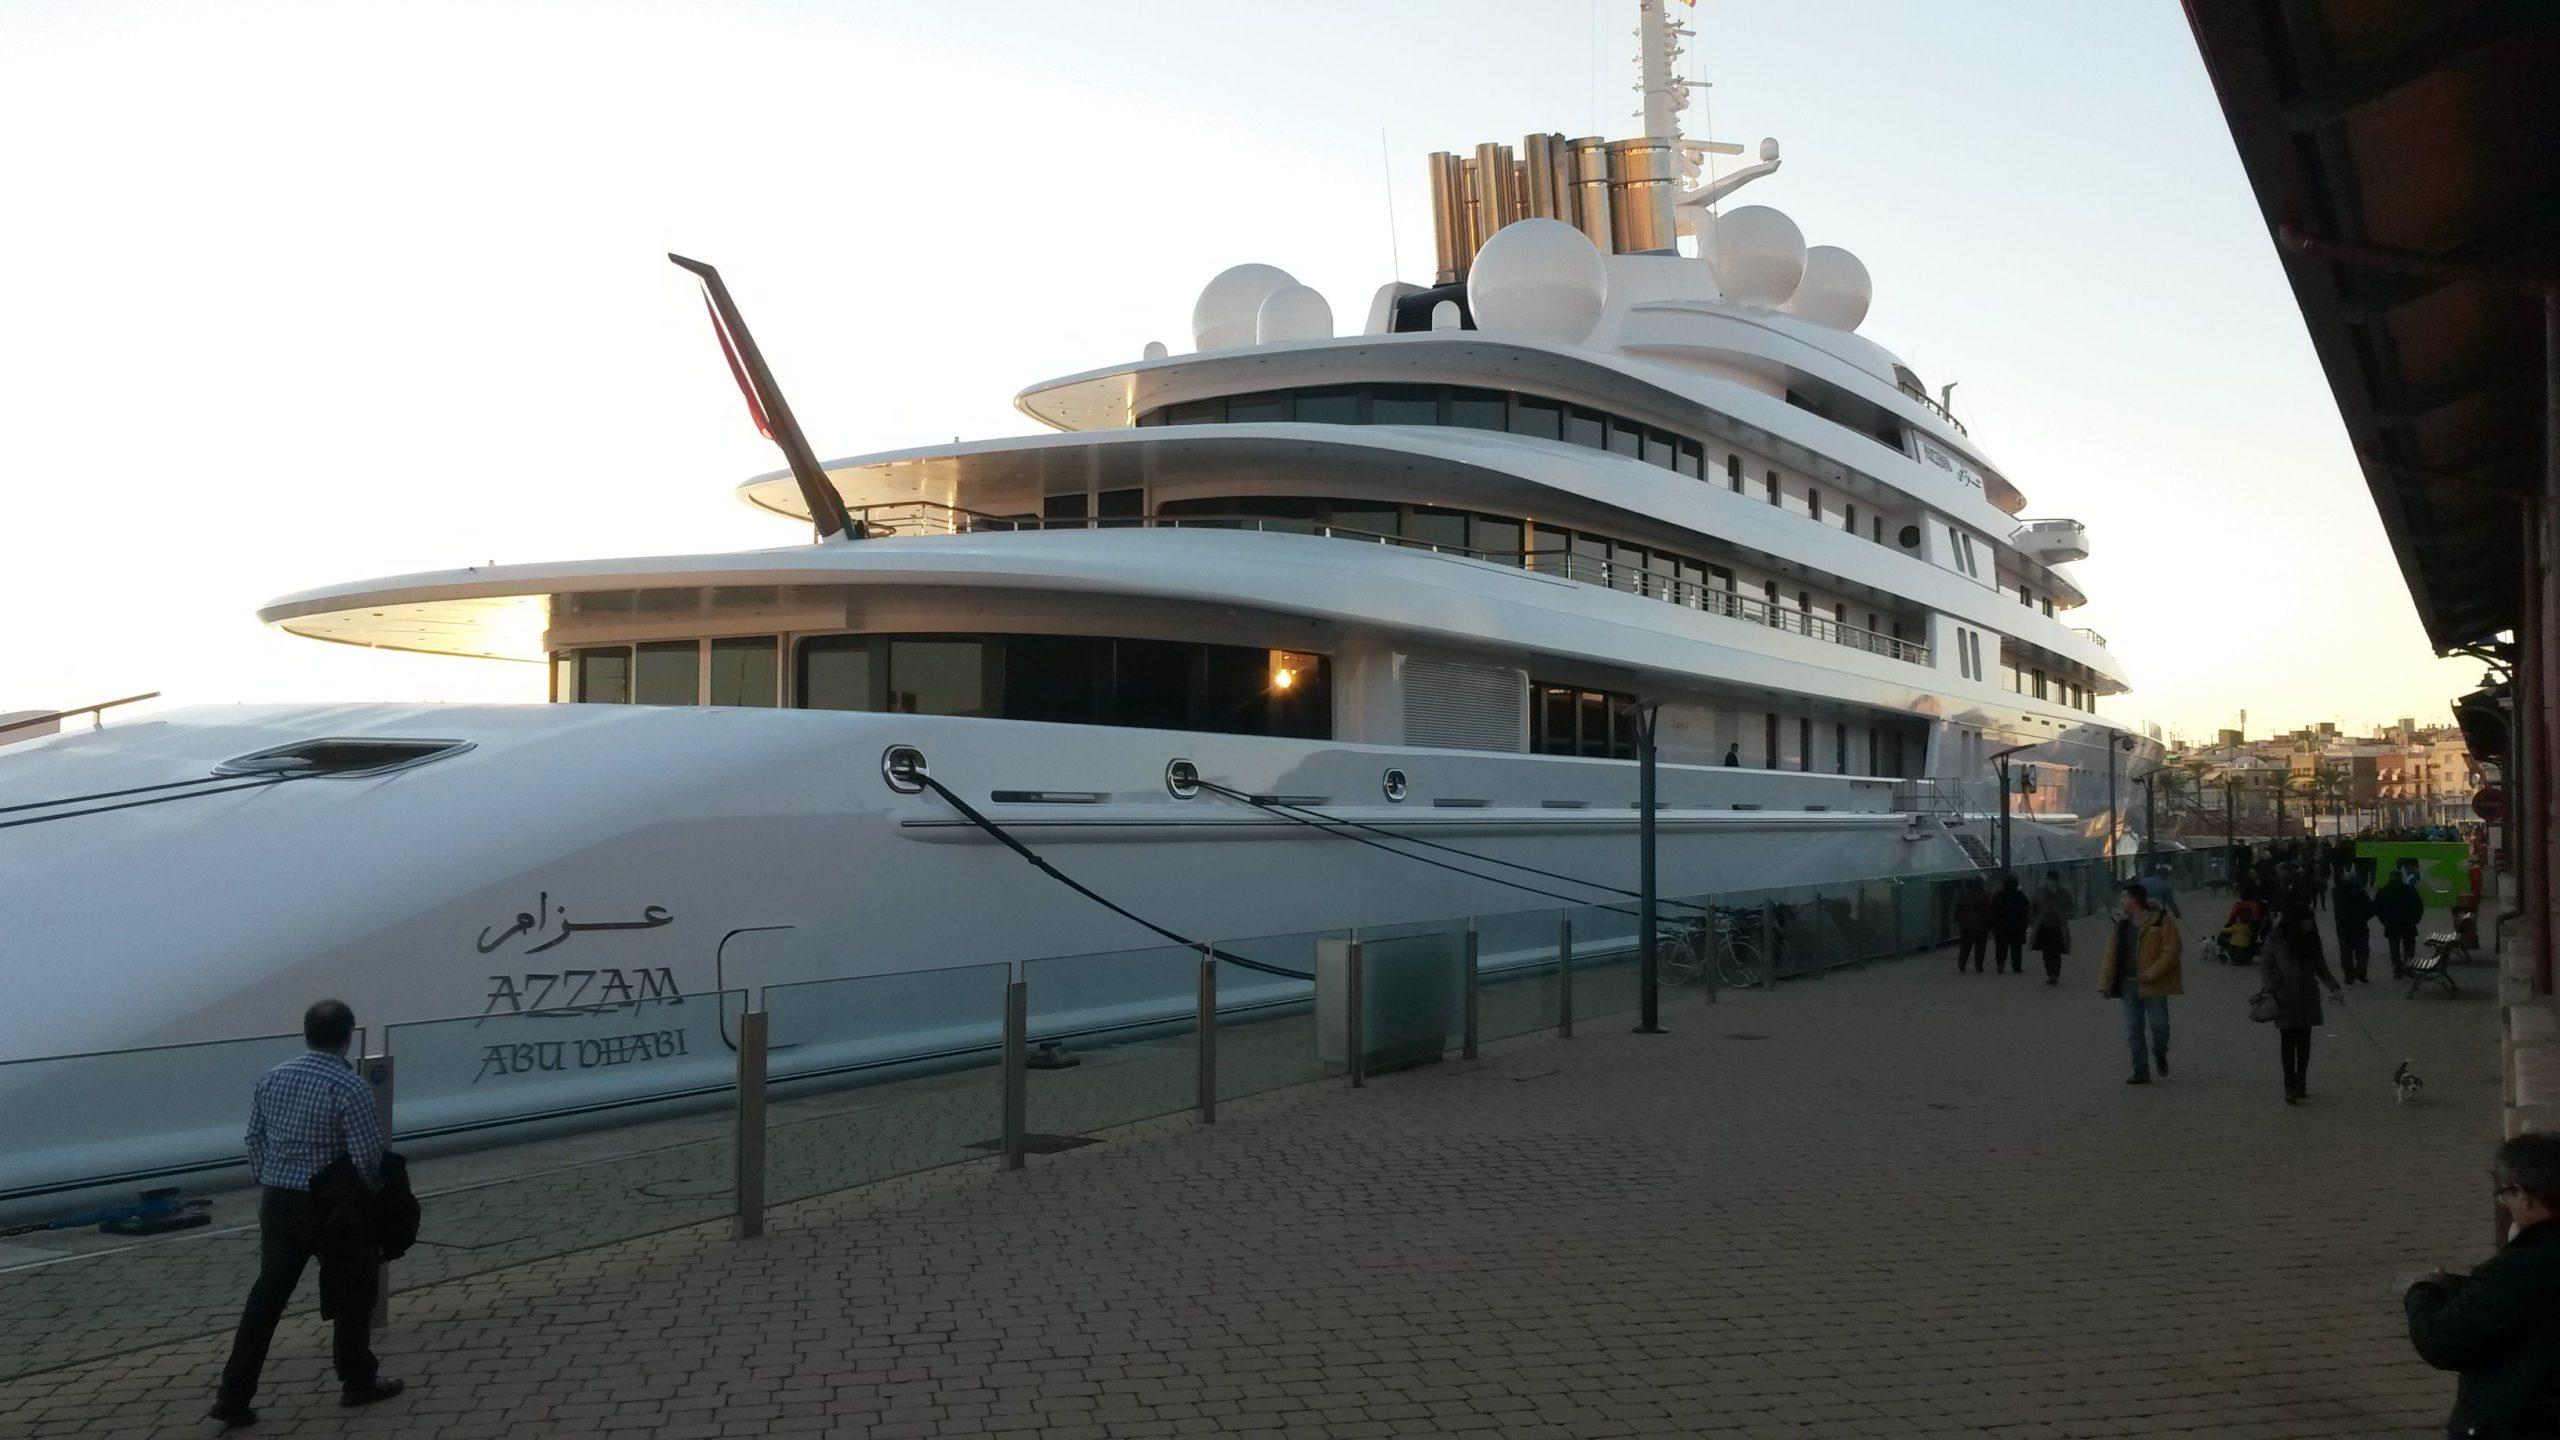 AZZAM Yacht - $600 MILLION